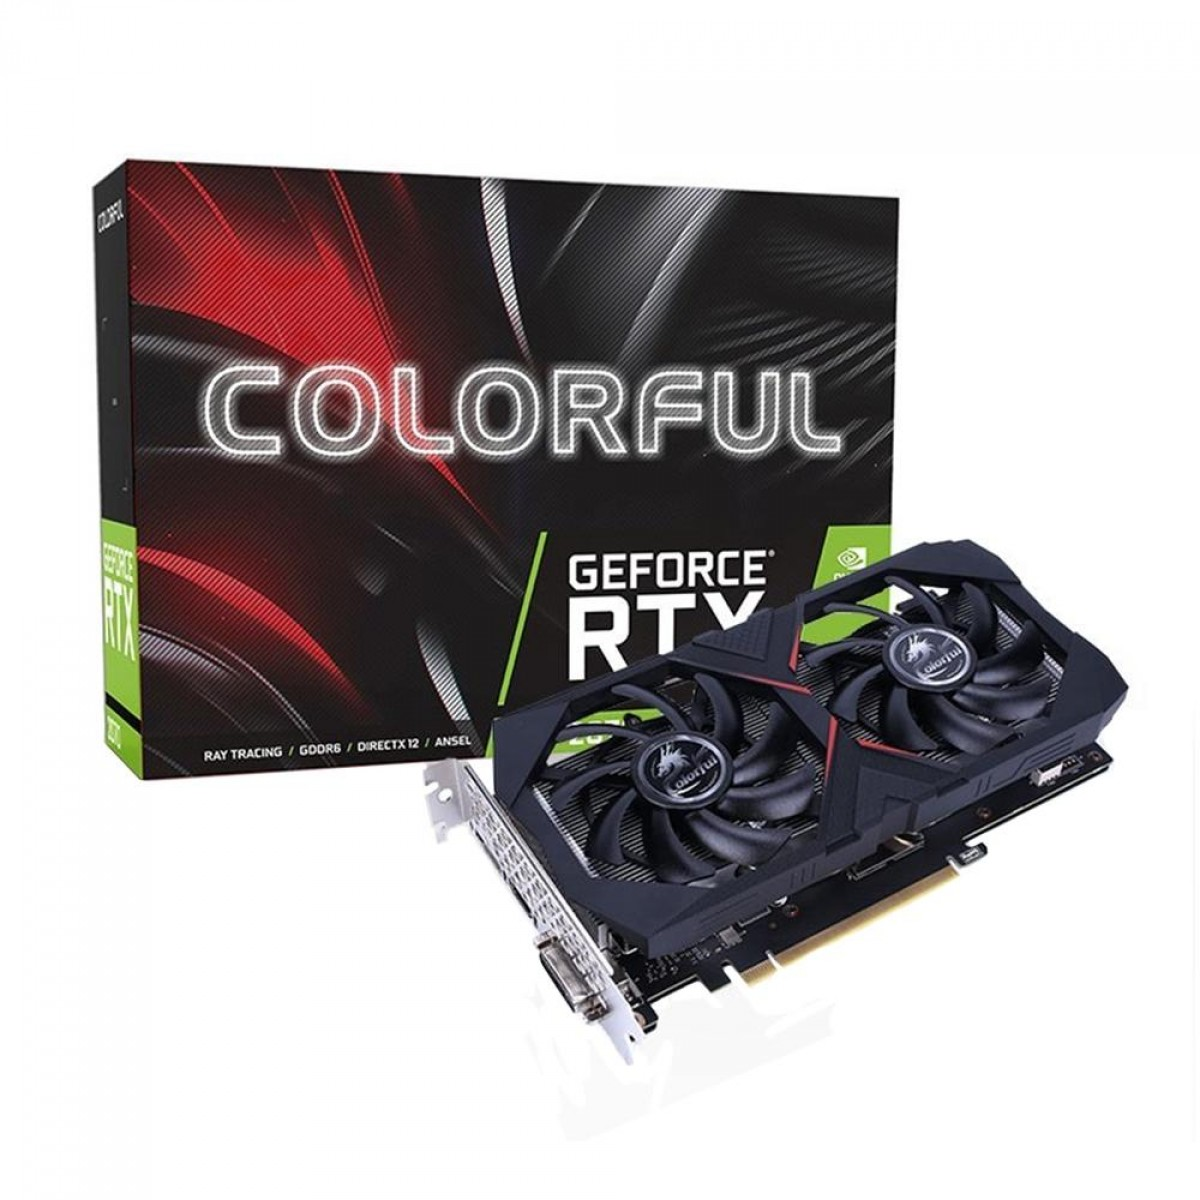 Placa de Vídeo Colorful, GeForce, RTX 2060 Super Dual, 8GB, GDDR6, 256Bit, RTX 2060 SUPER 8G-V